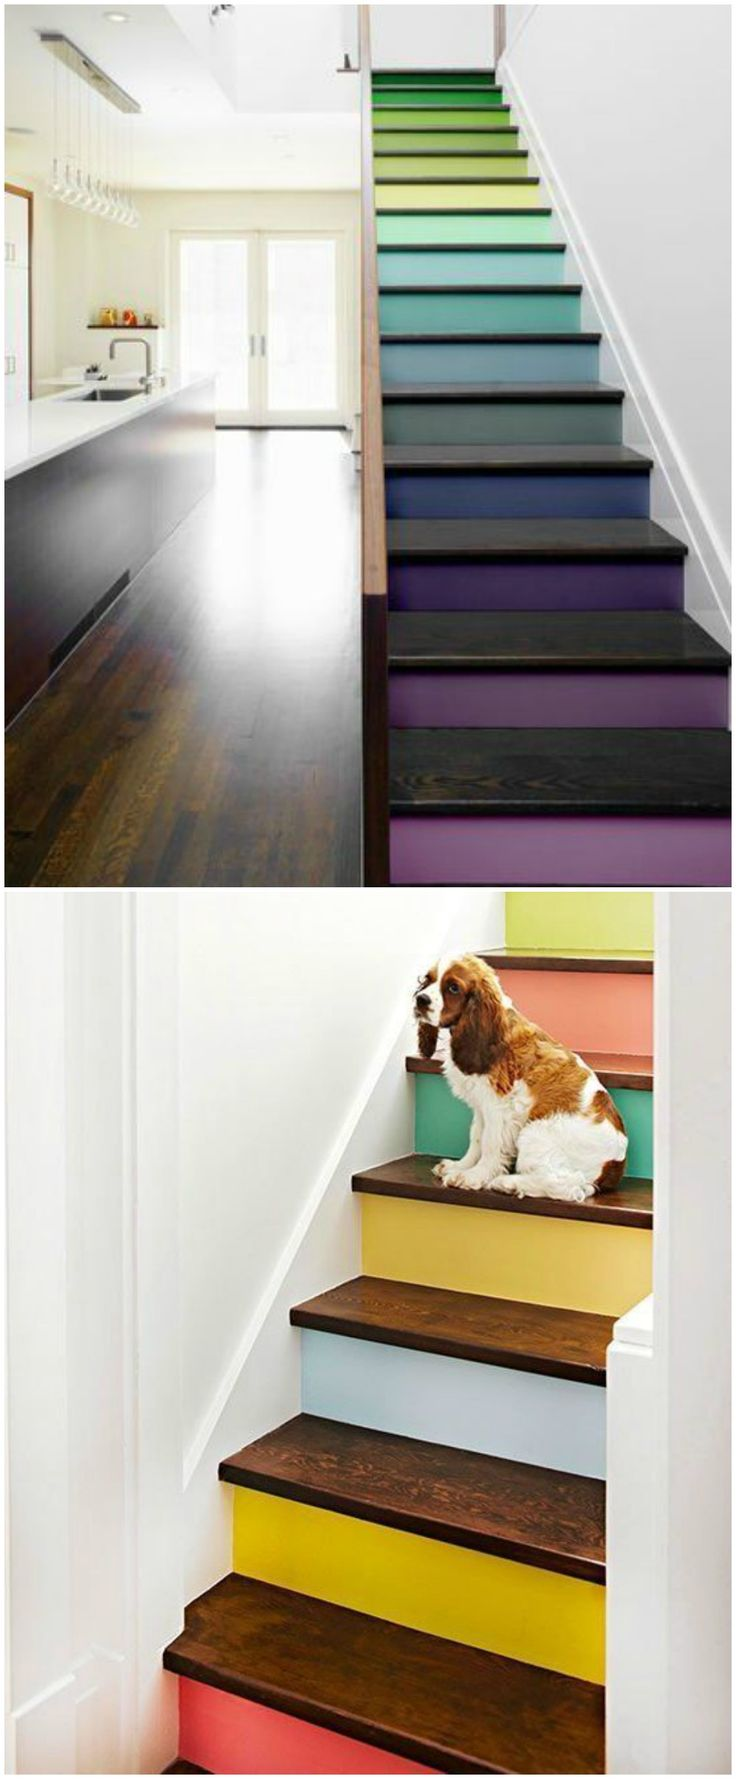 M s de 25 ideas incre bles sobre pintar escaleras en for Diferentes colores para pintar una casa